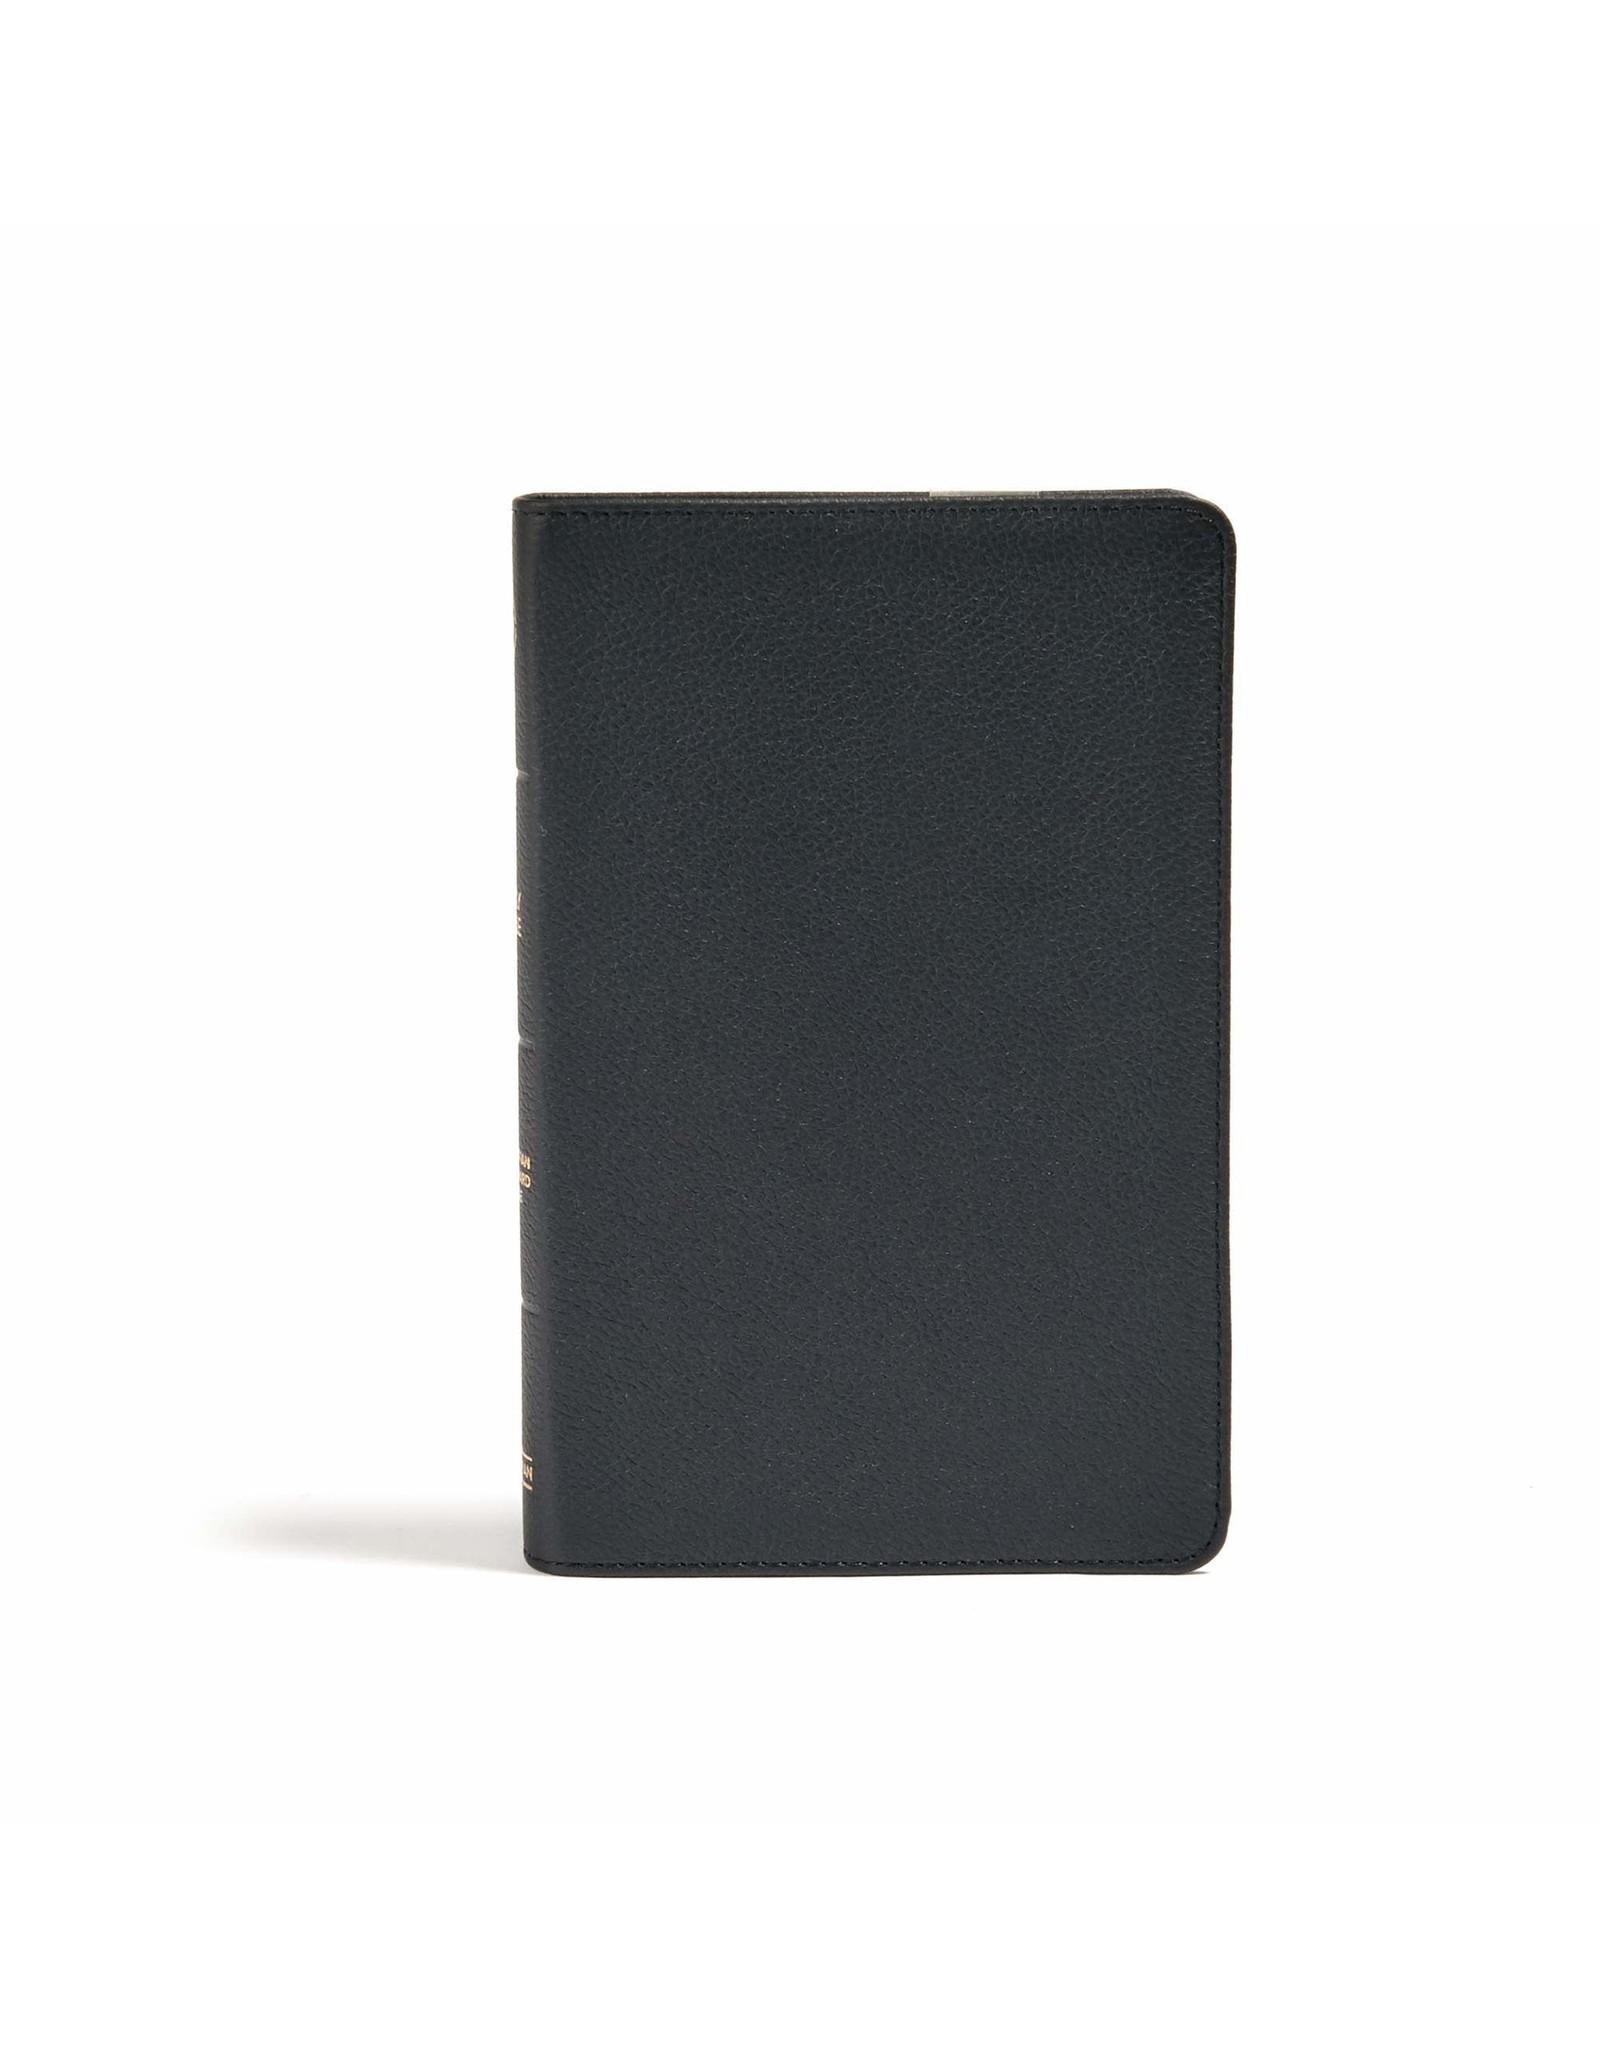 Holman CSB Personal Size Bible - Genuine Leather Black